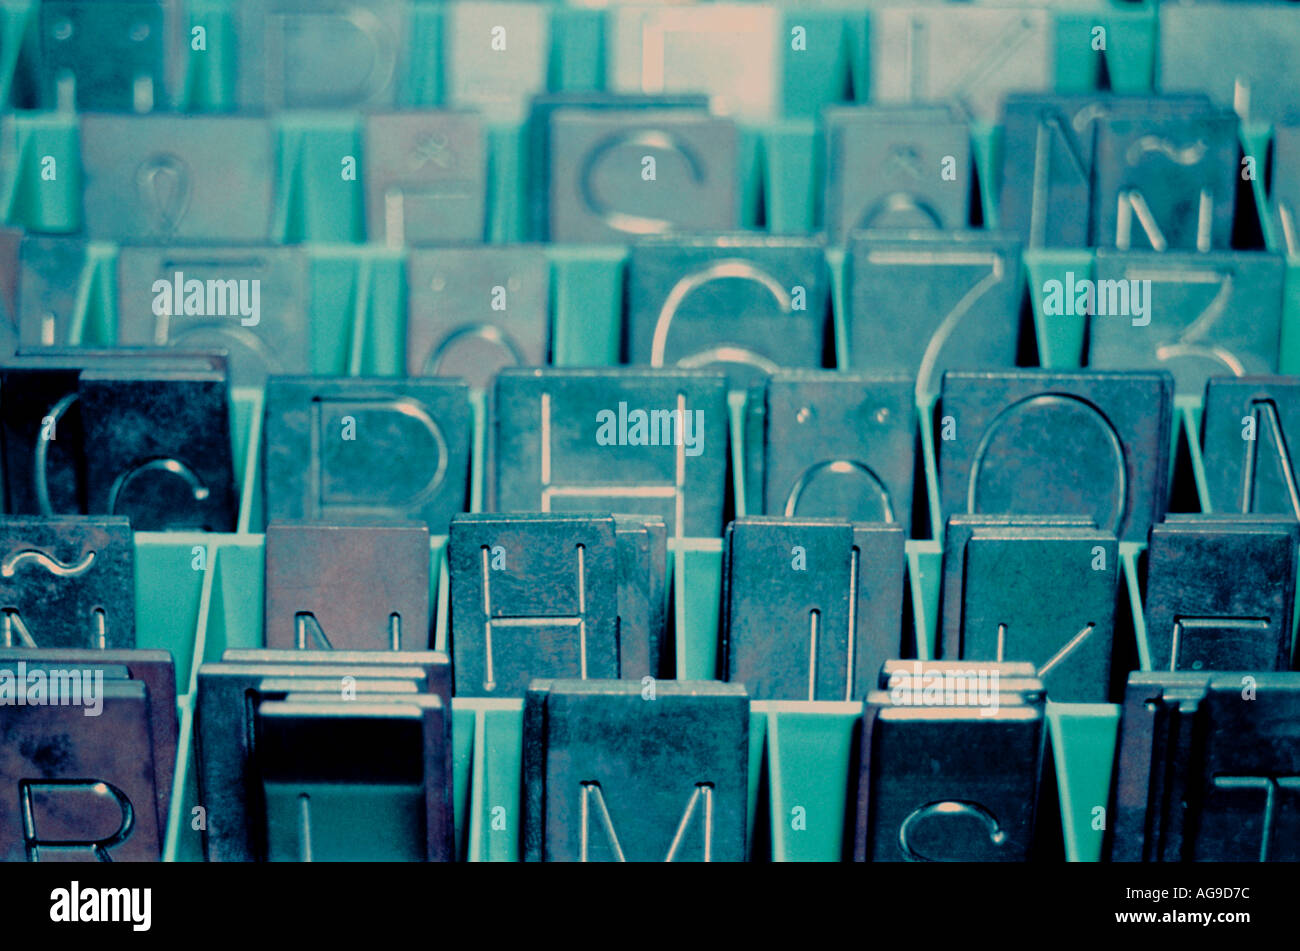 Gravure plaques alphabet Photo Stock